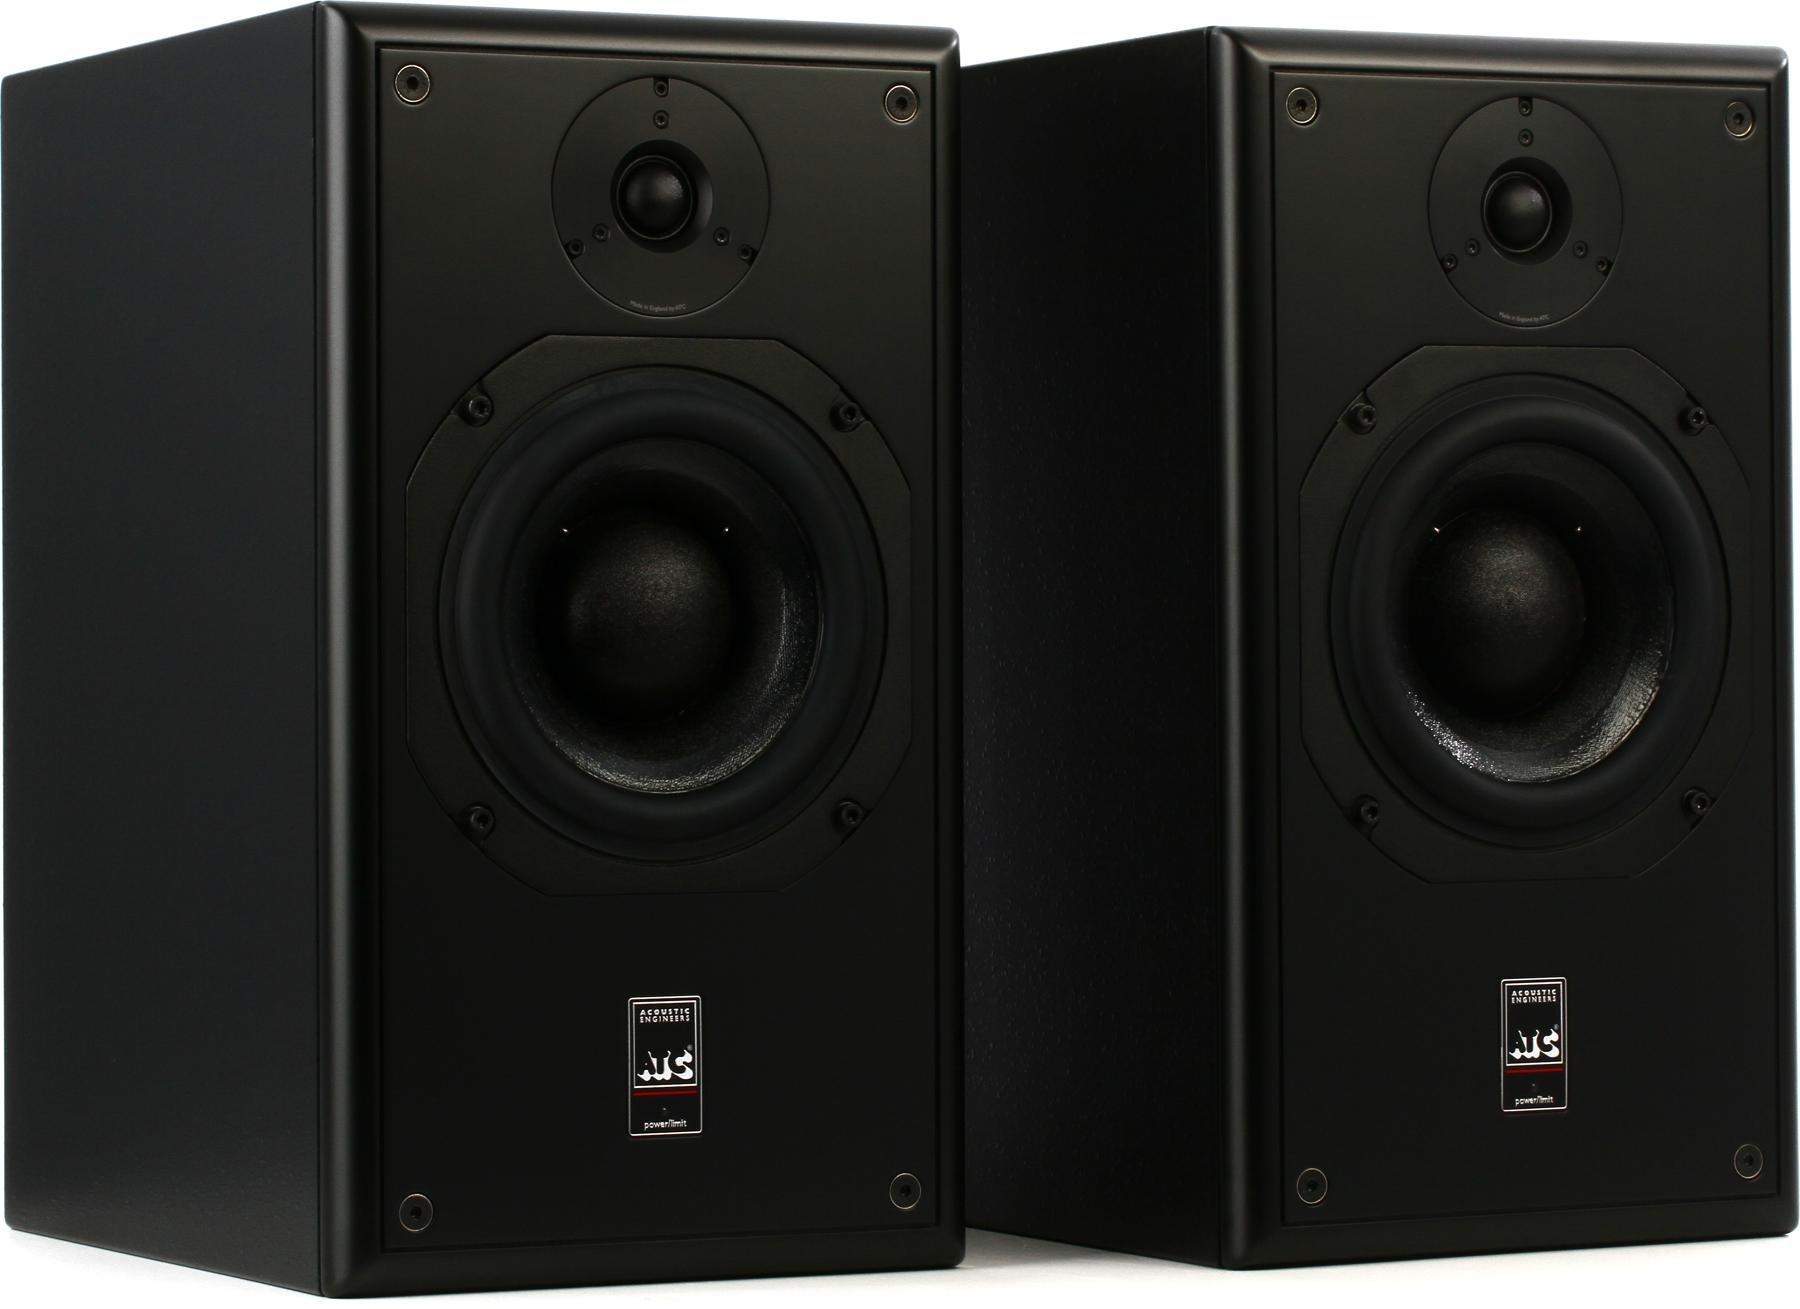 Atc Scm20asl Pro Mk2 65 Powered Studio Monitors Sweetwater Sonic Gear Quatro 2 Portable 20 Speaker Image 1